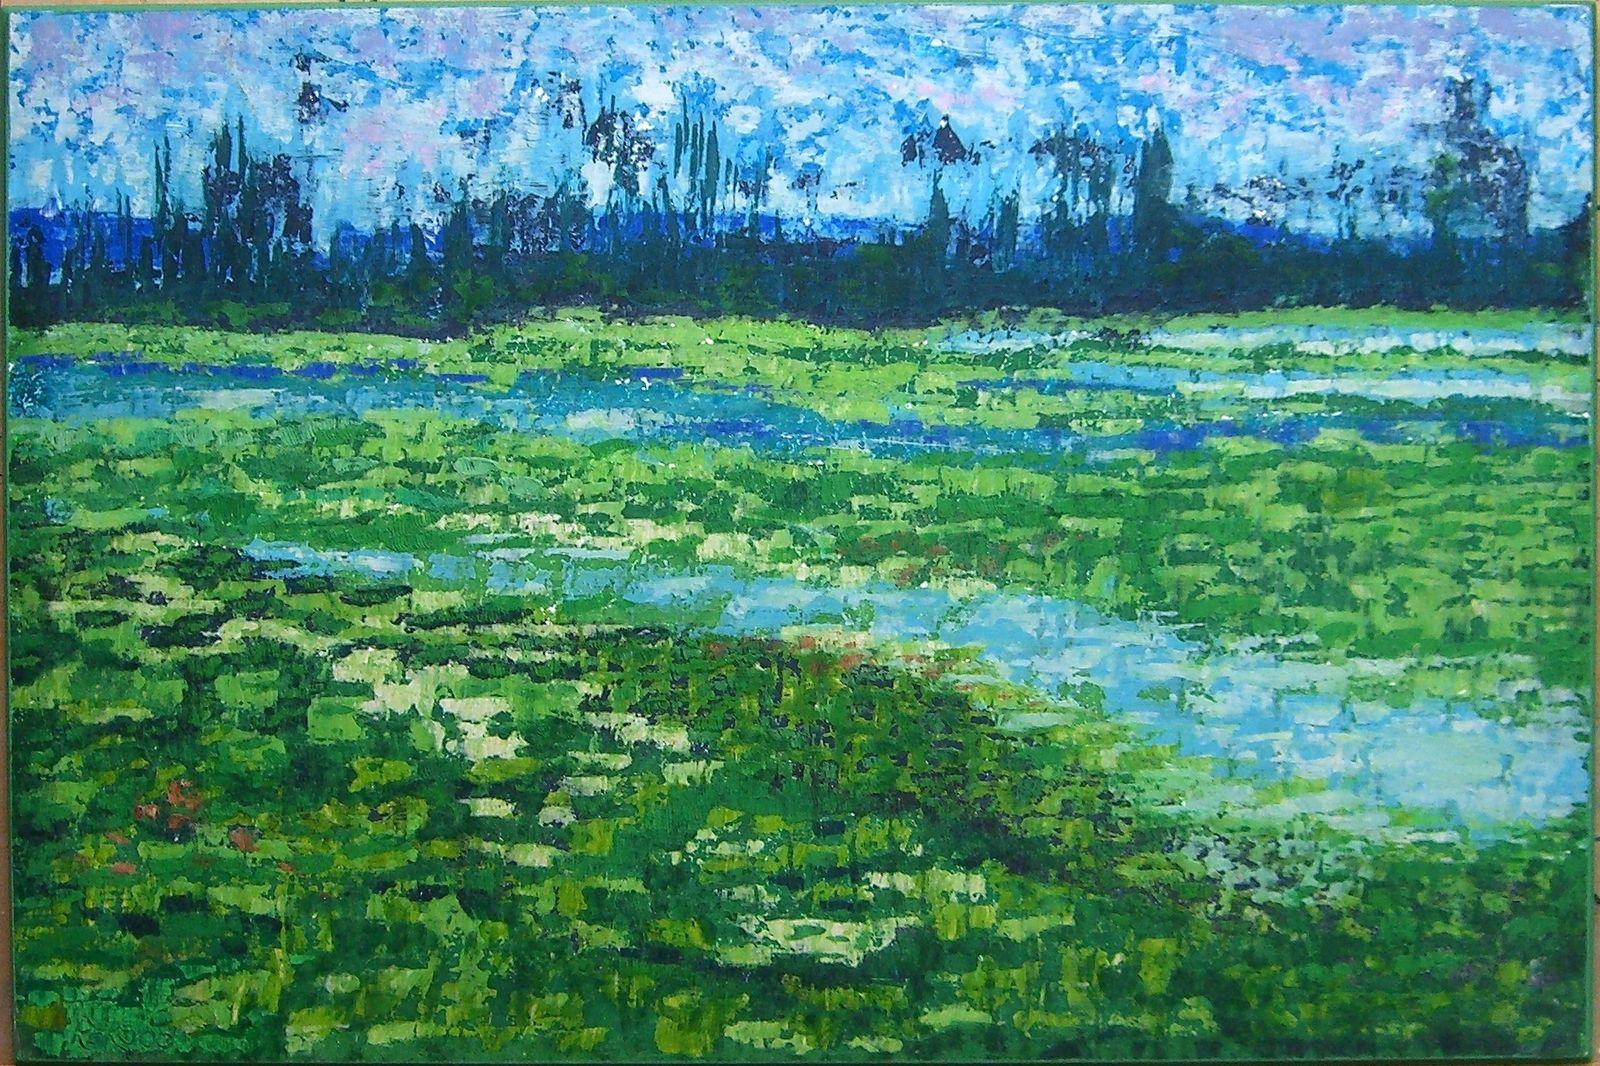 Sumpflandschaft, 2000, Ako-Spachtel, 47x71 cm